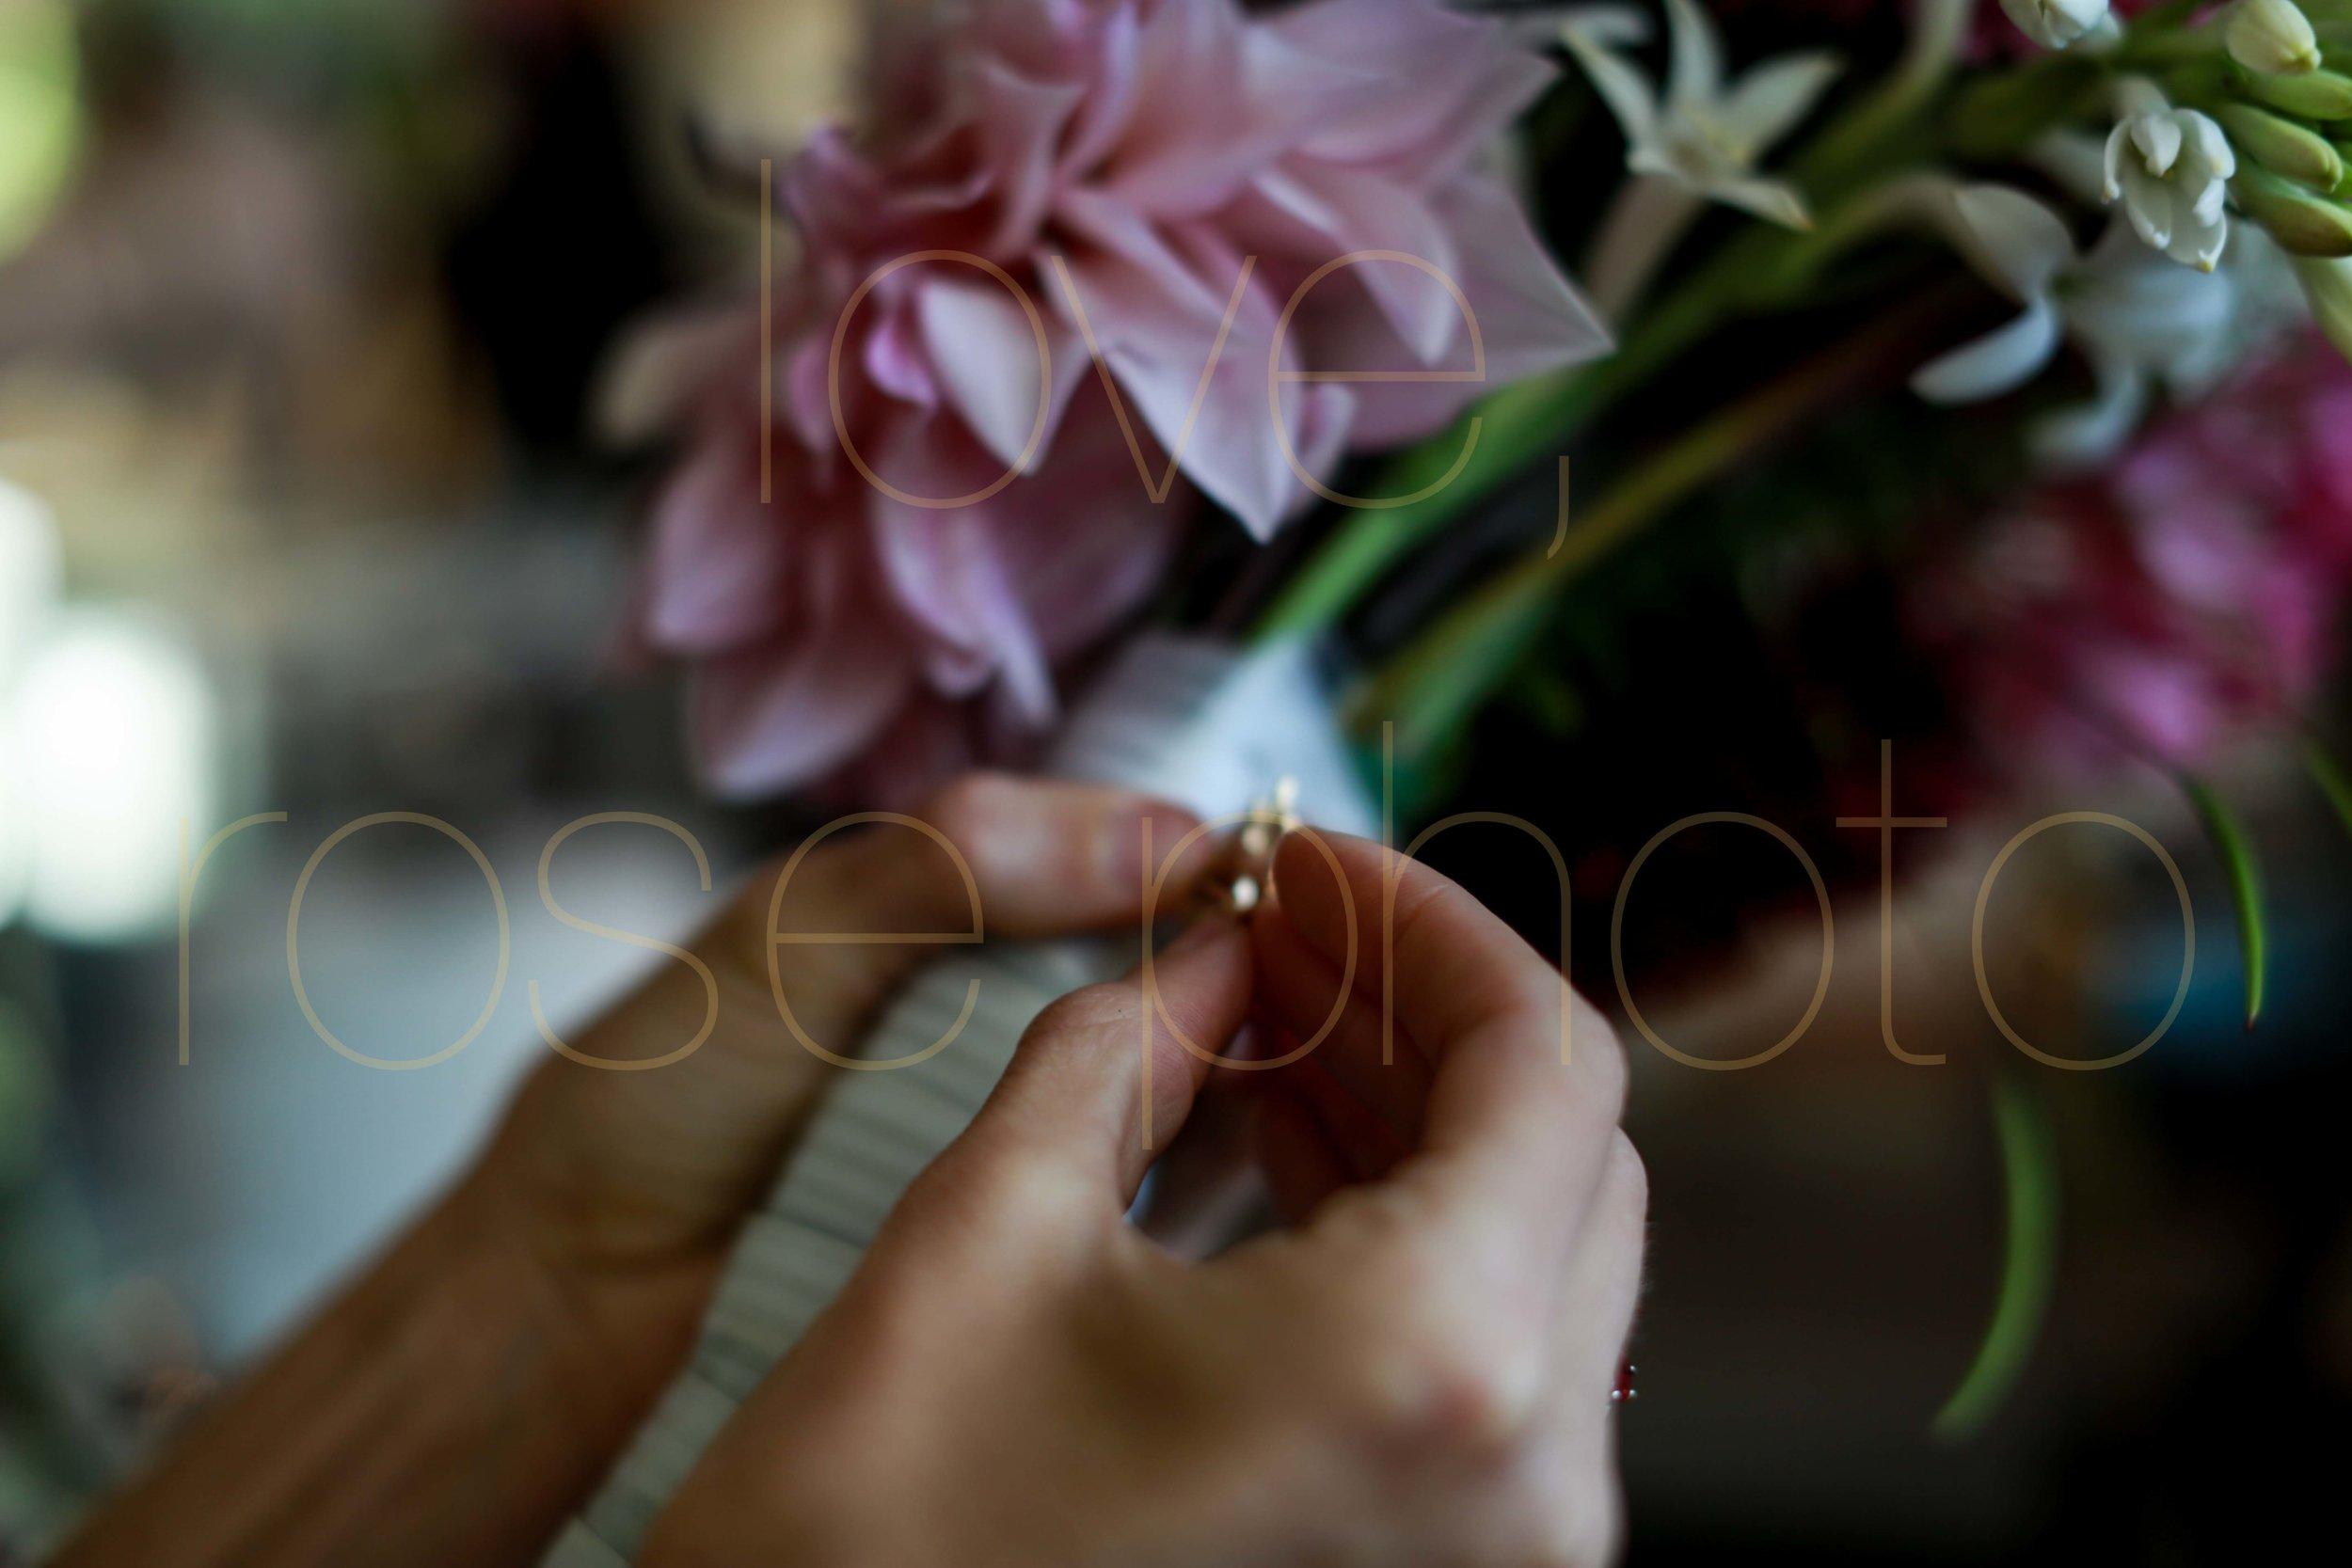 Rose Photo Asheville Wedding Photographer Nasheville Weddings Charleston Bride Chicago photojournalist weddings -2.jpg